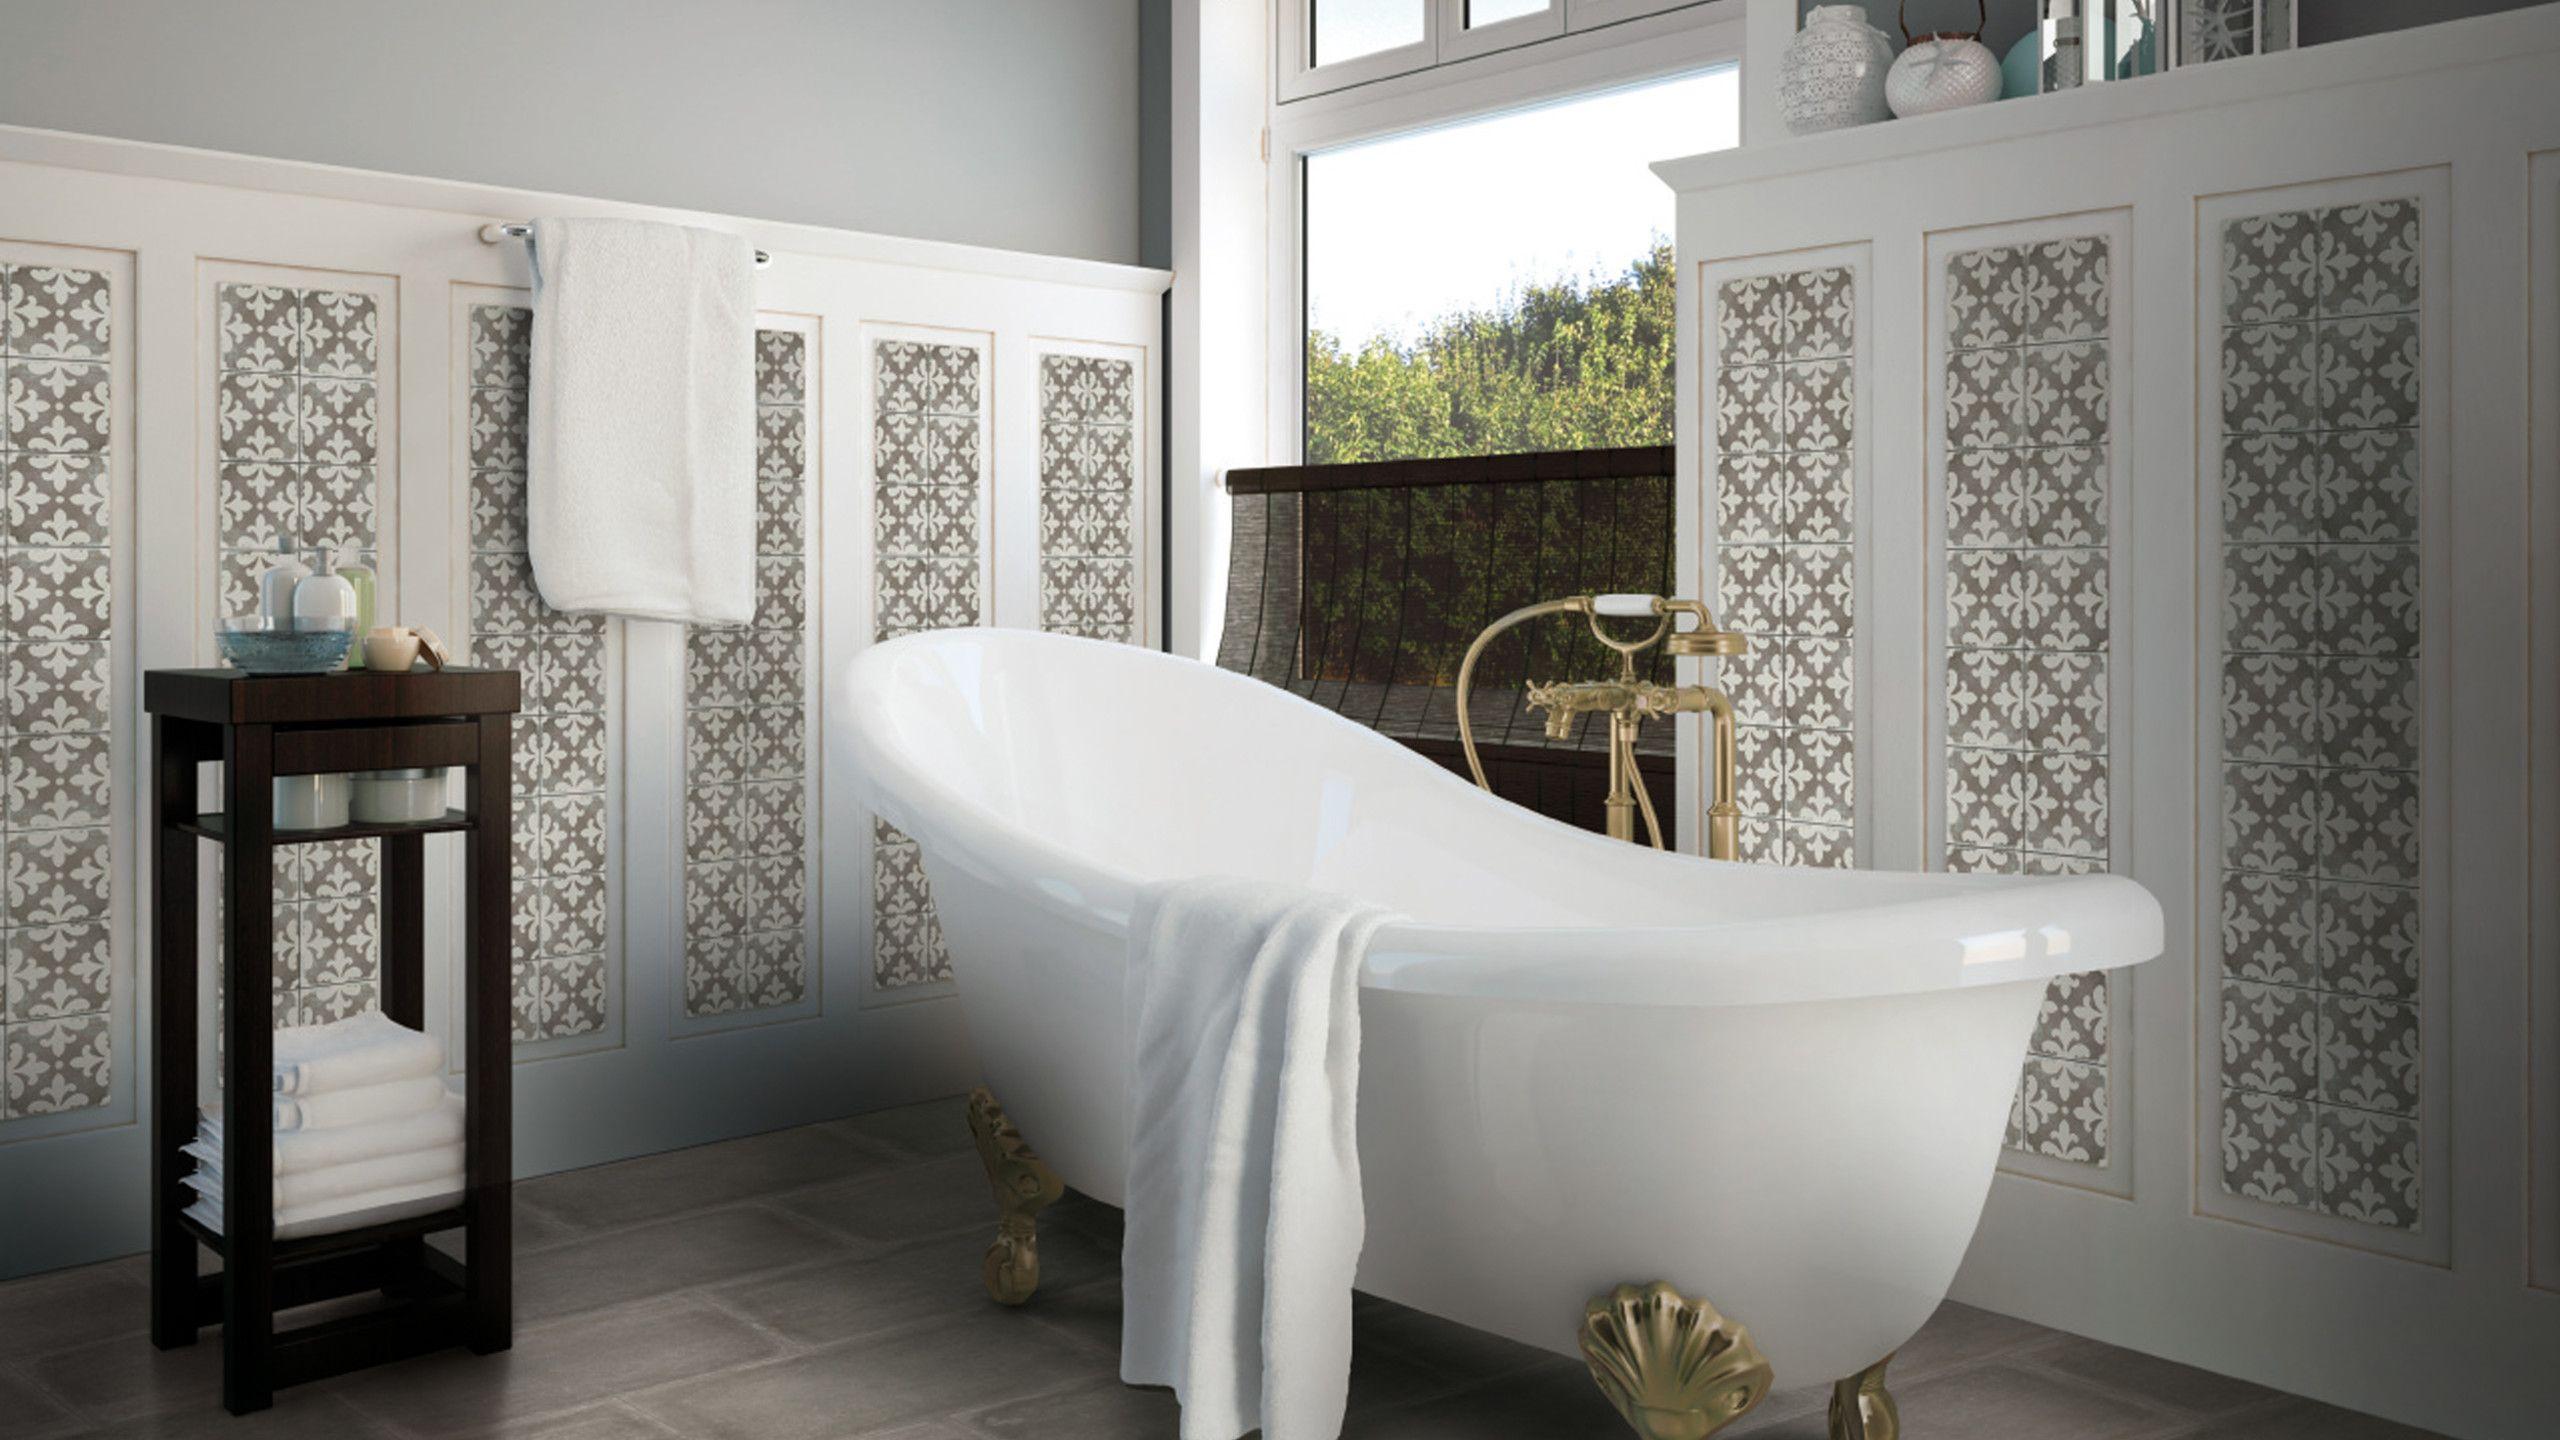 Palazzo 12 X 12 Floor Wall Tile In Antique Cotto Stylish Bathroom Tile Bathroom Bathrooms Remodel